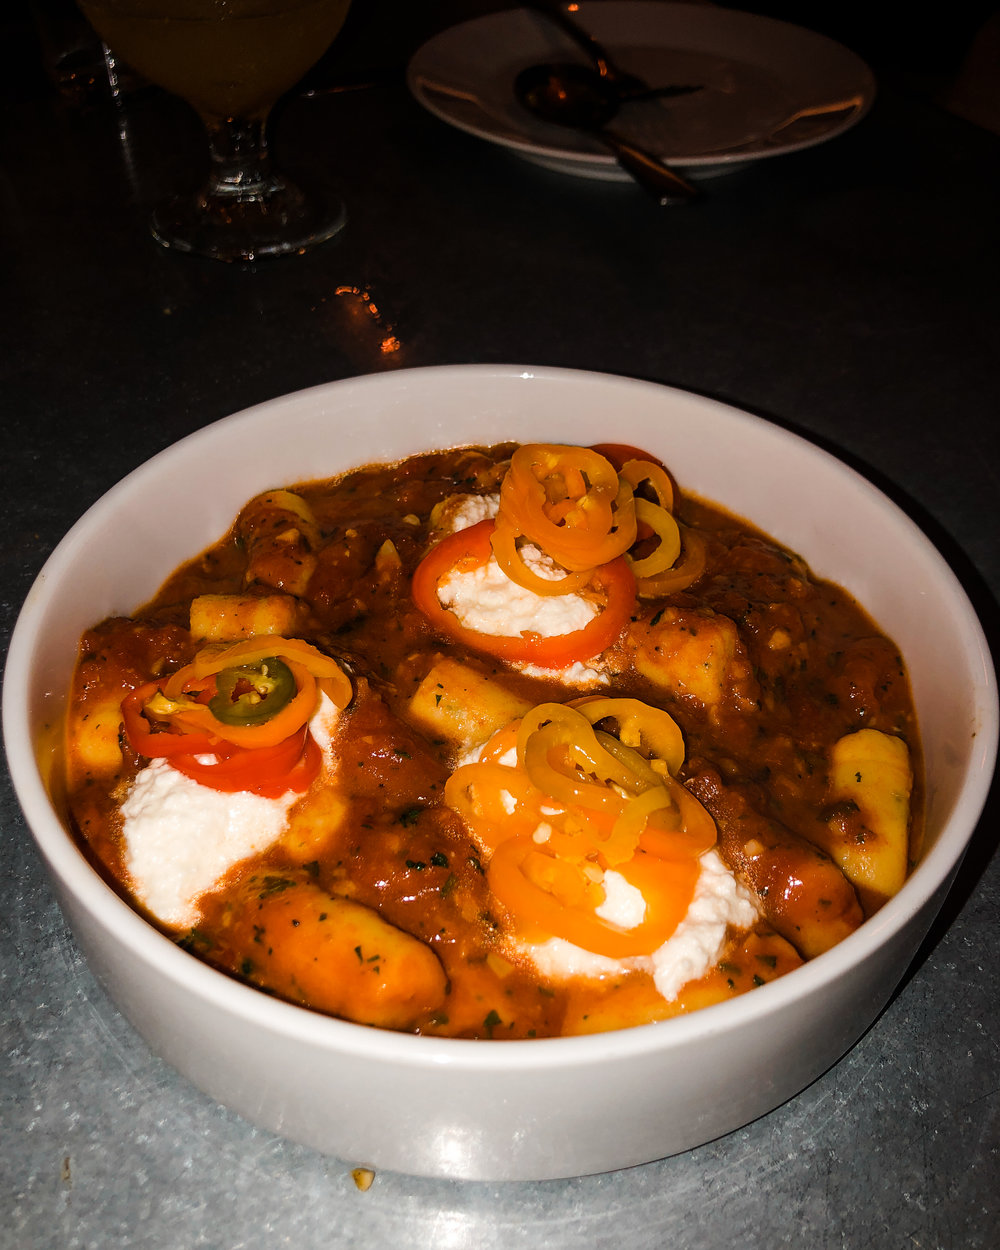 Gnocchi with smoked ricotta